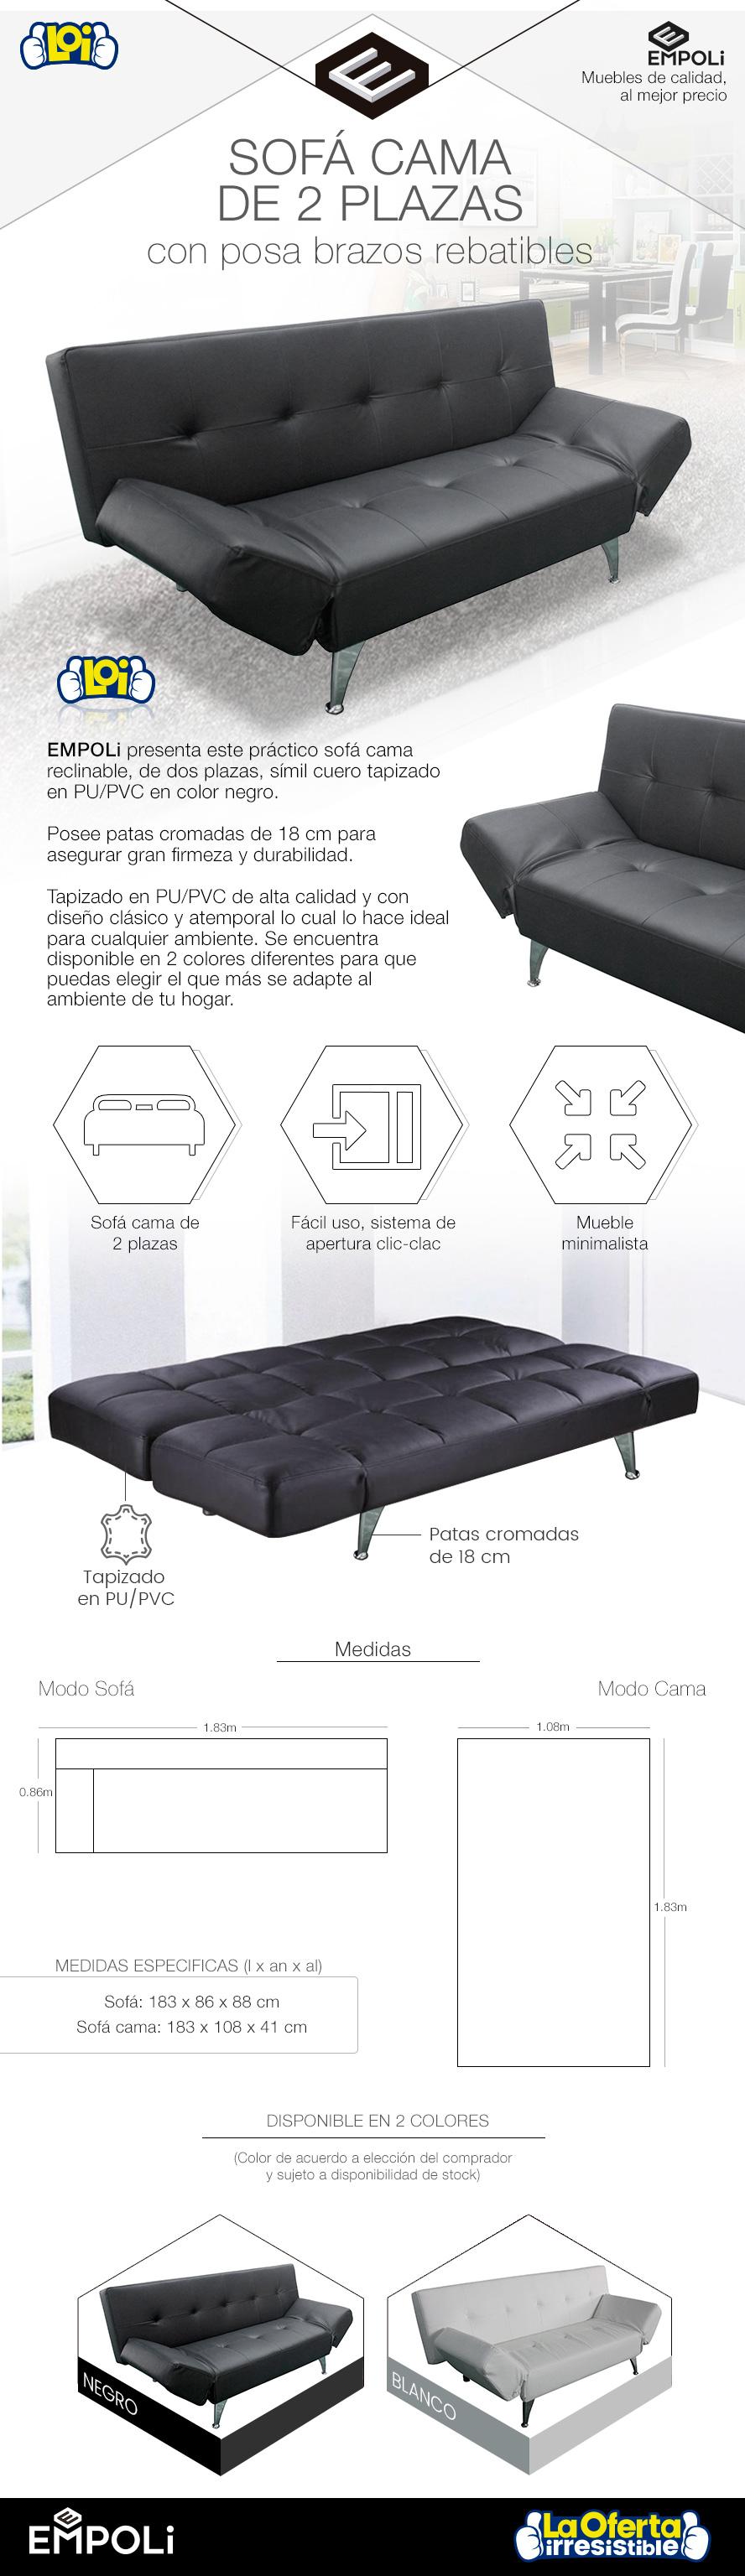 Sof cama empoli 2 plazas pozabrasos rebatibles 016a bk for Sofa cama 2 plazas oferta